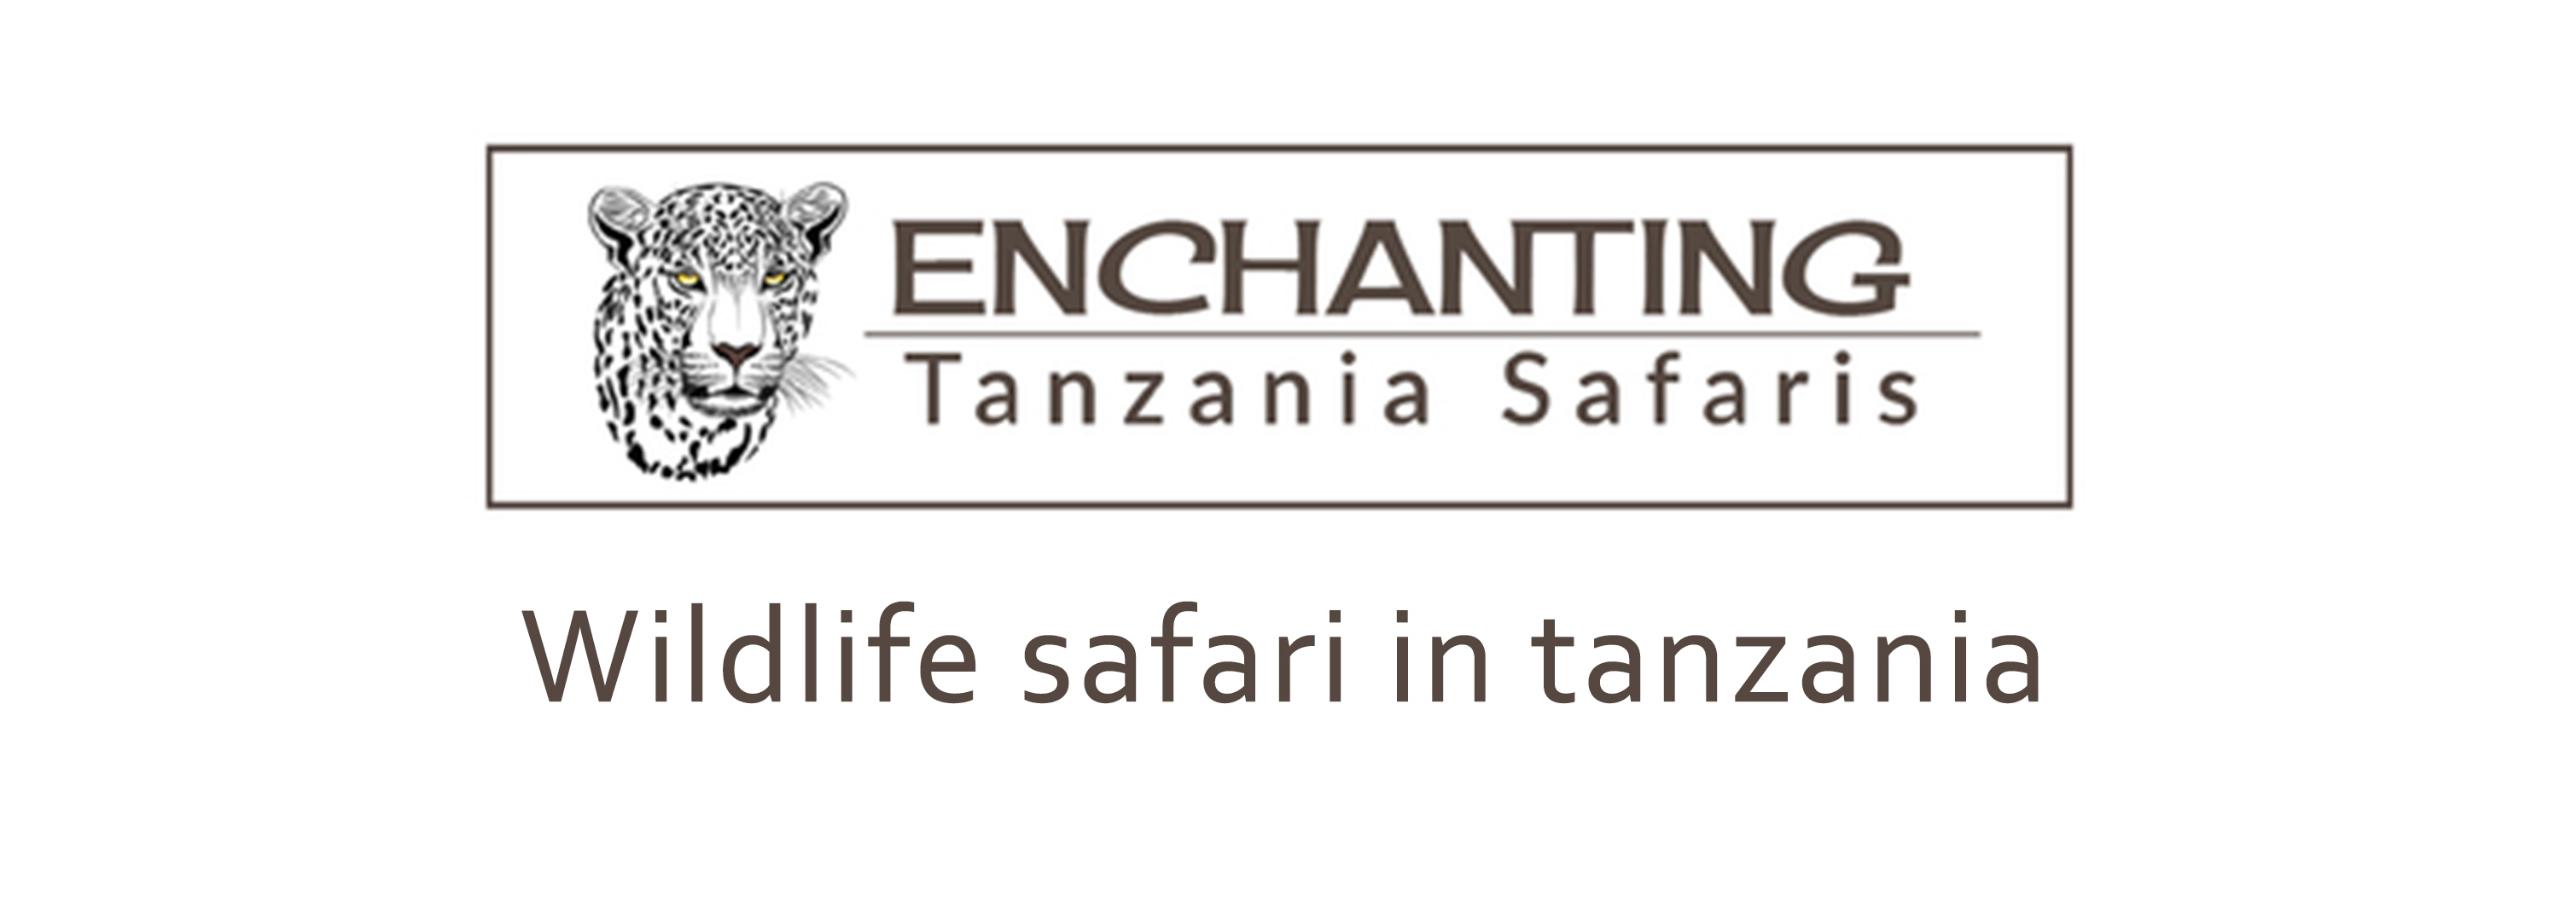 enchanting-tanzania-safaris (@etsarusha) Cover Image